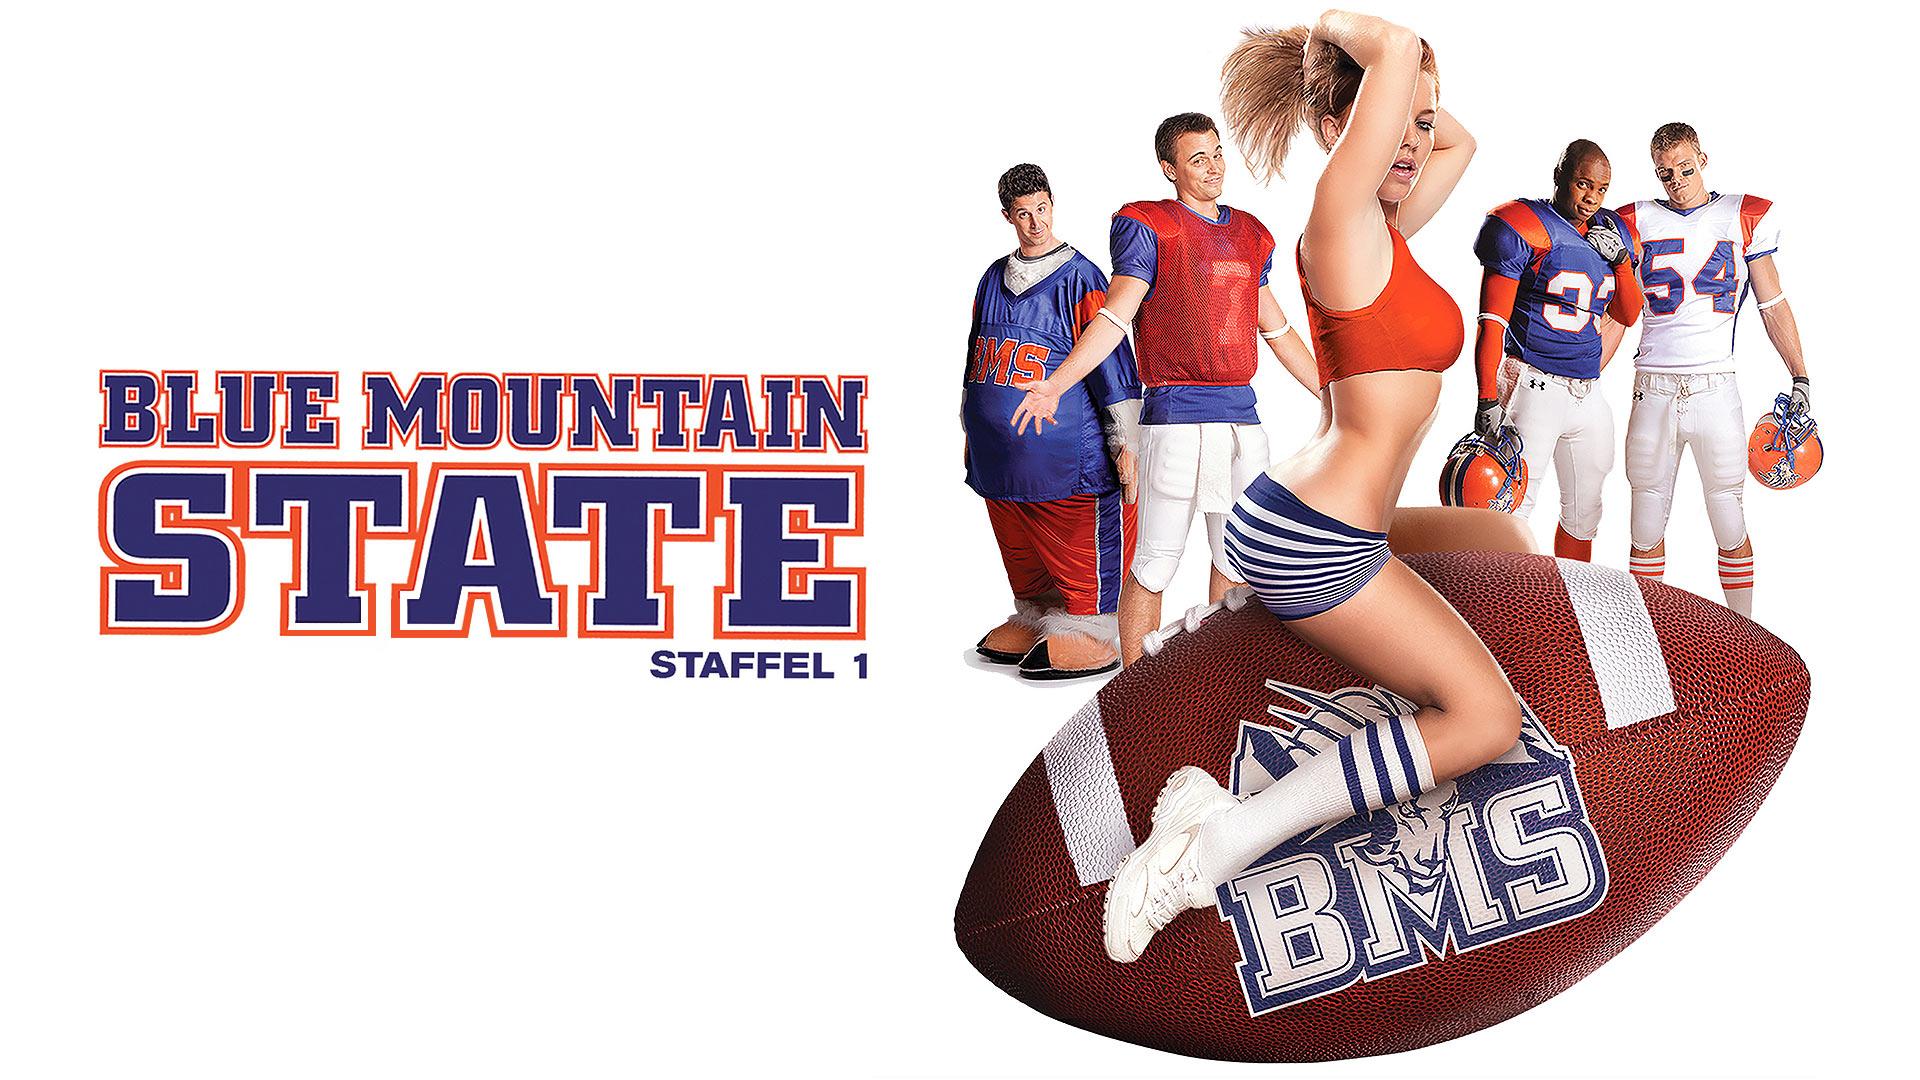 Blue Mountain State - Staffel 1 [dt./OV]